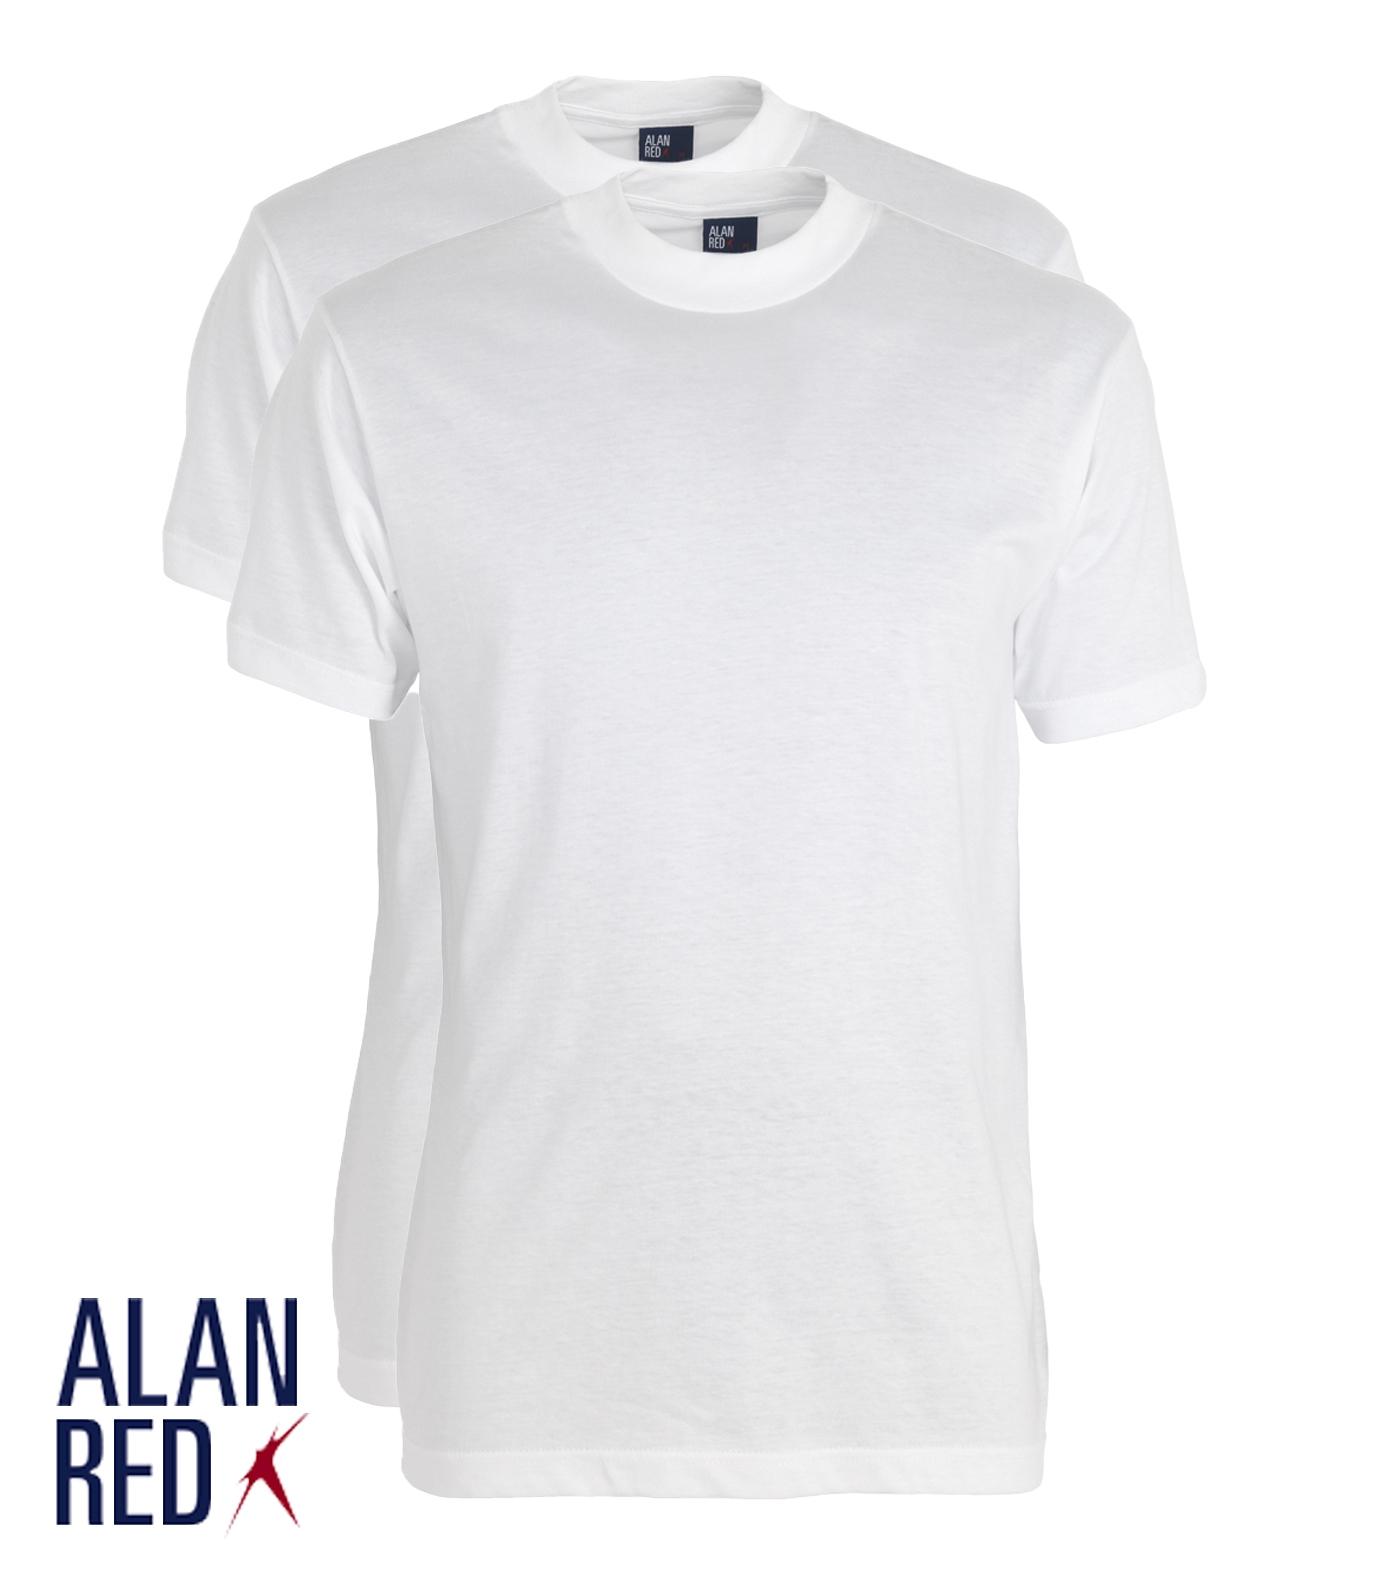 Alan red t shirt virginia 2pack superdeal for Designhotel maastricht comfort xl